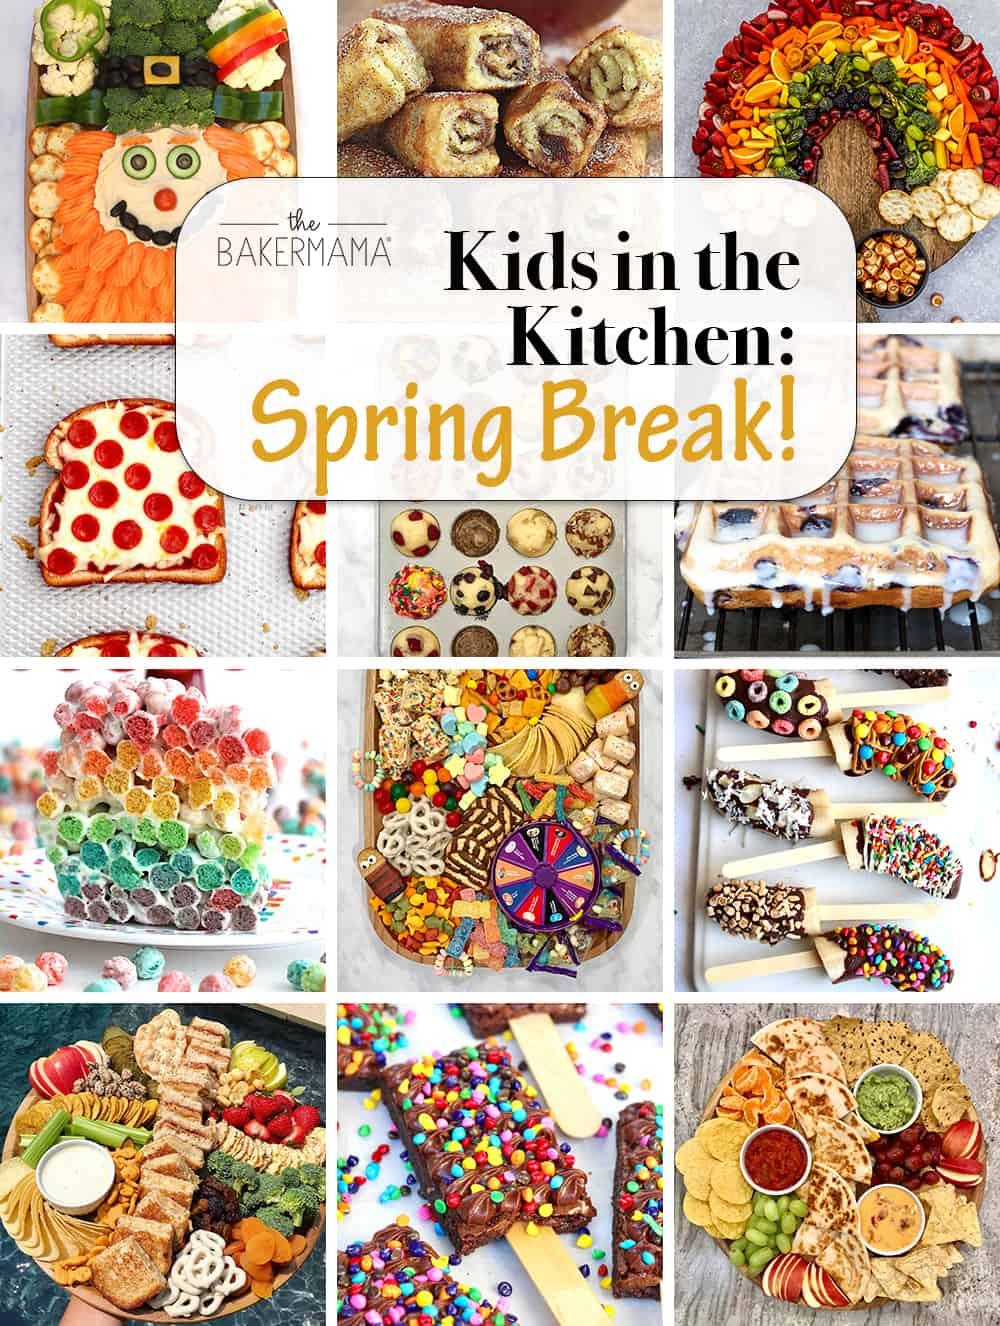 Kids in the Kitchen Spring Break by the BakerMama